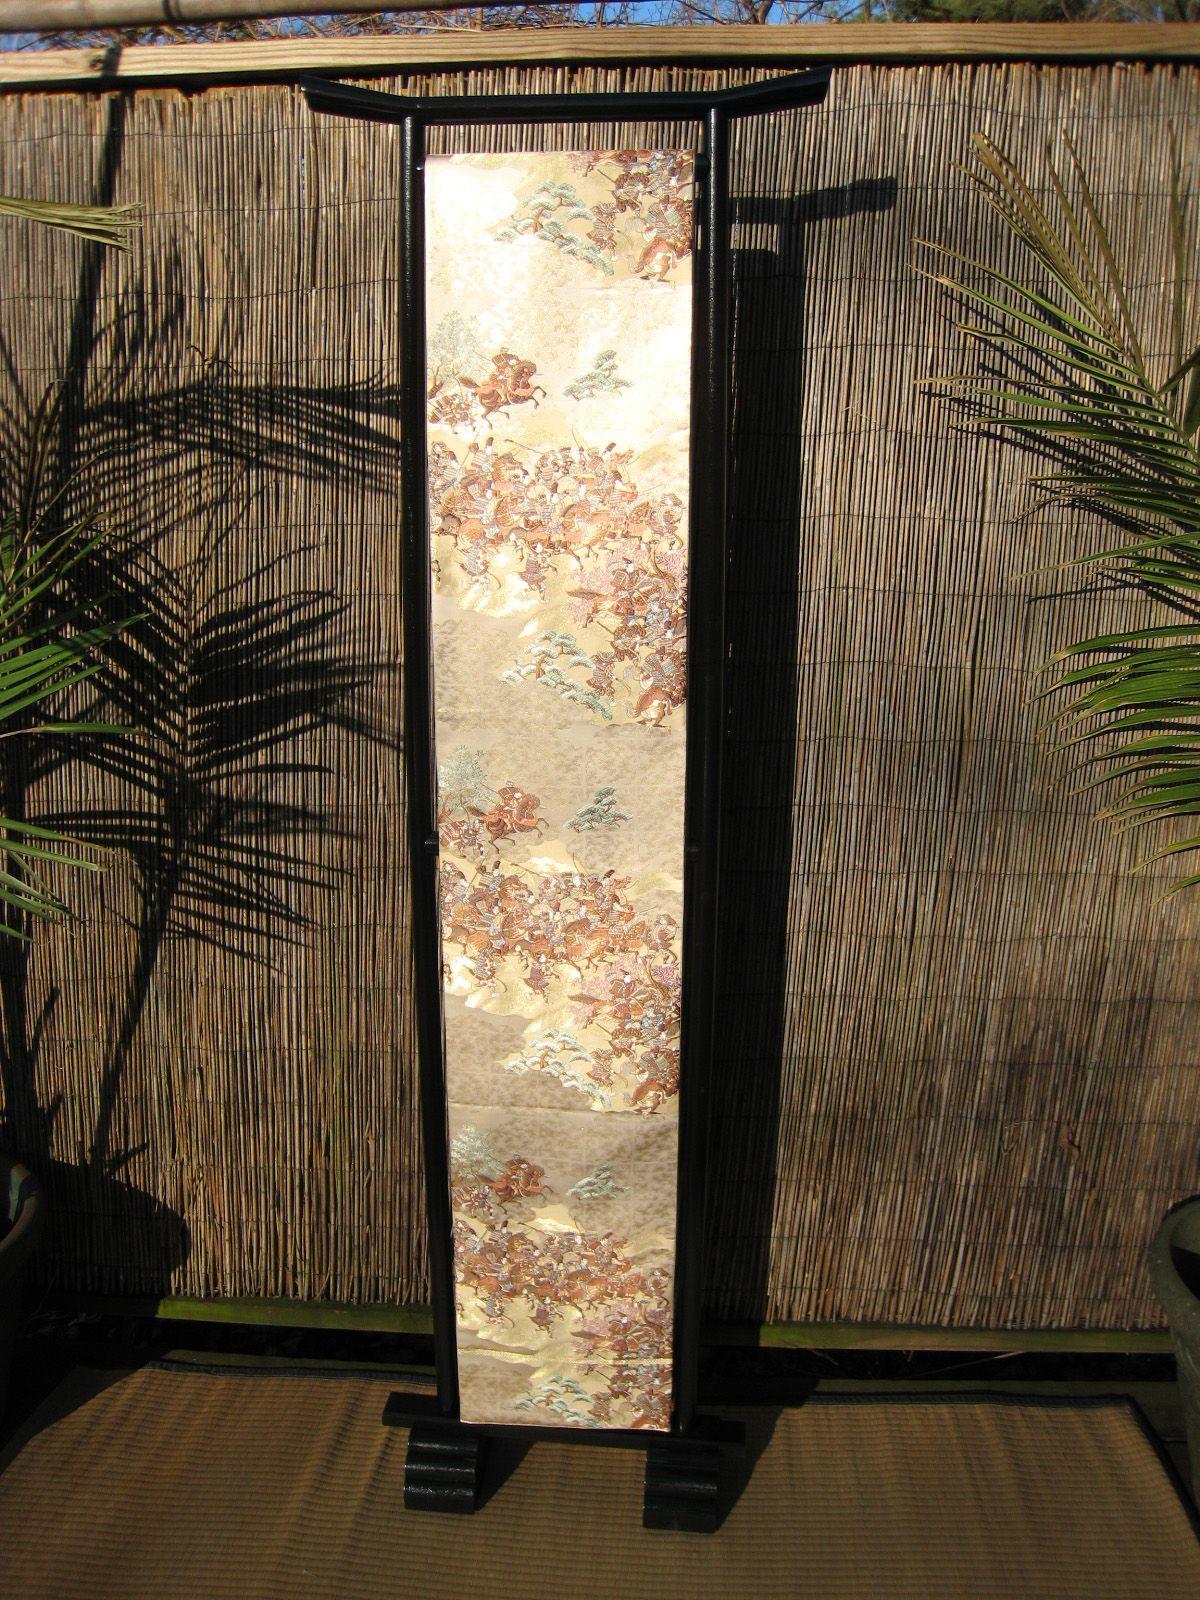 obi,obi stand, obi display | Asian inspired decor, Asian decor